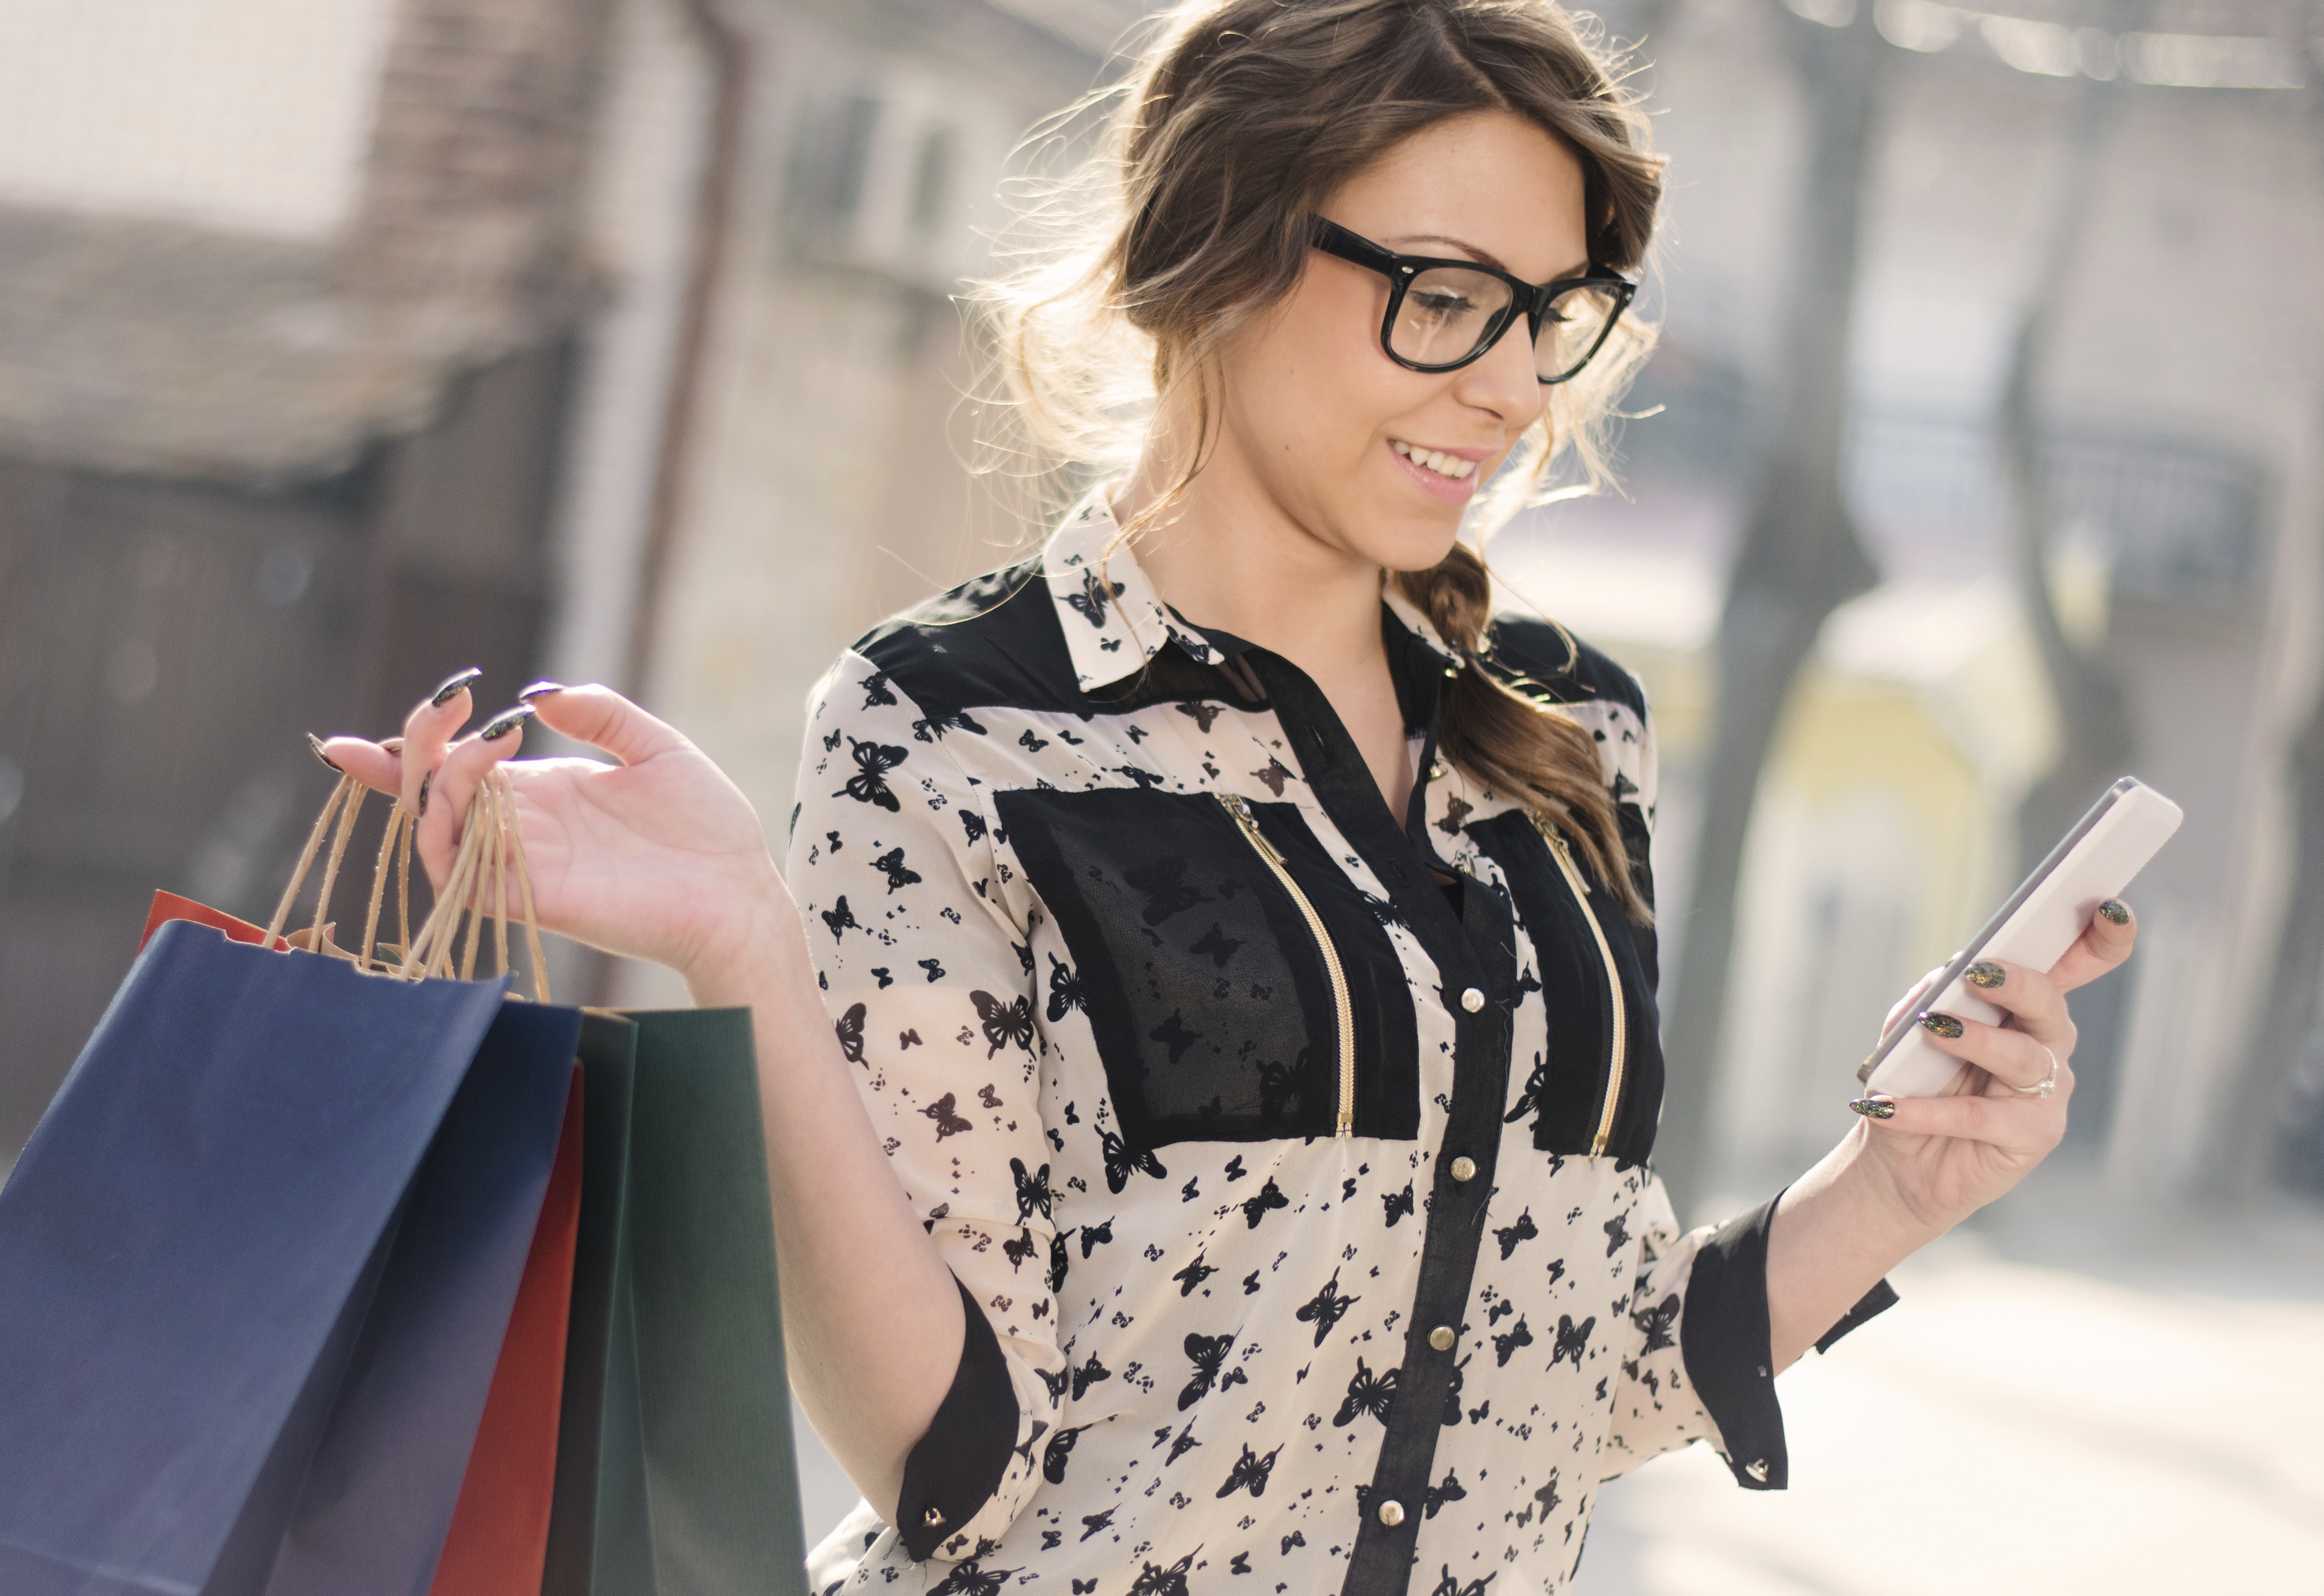 mobile, shopping, mobile wallet